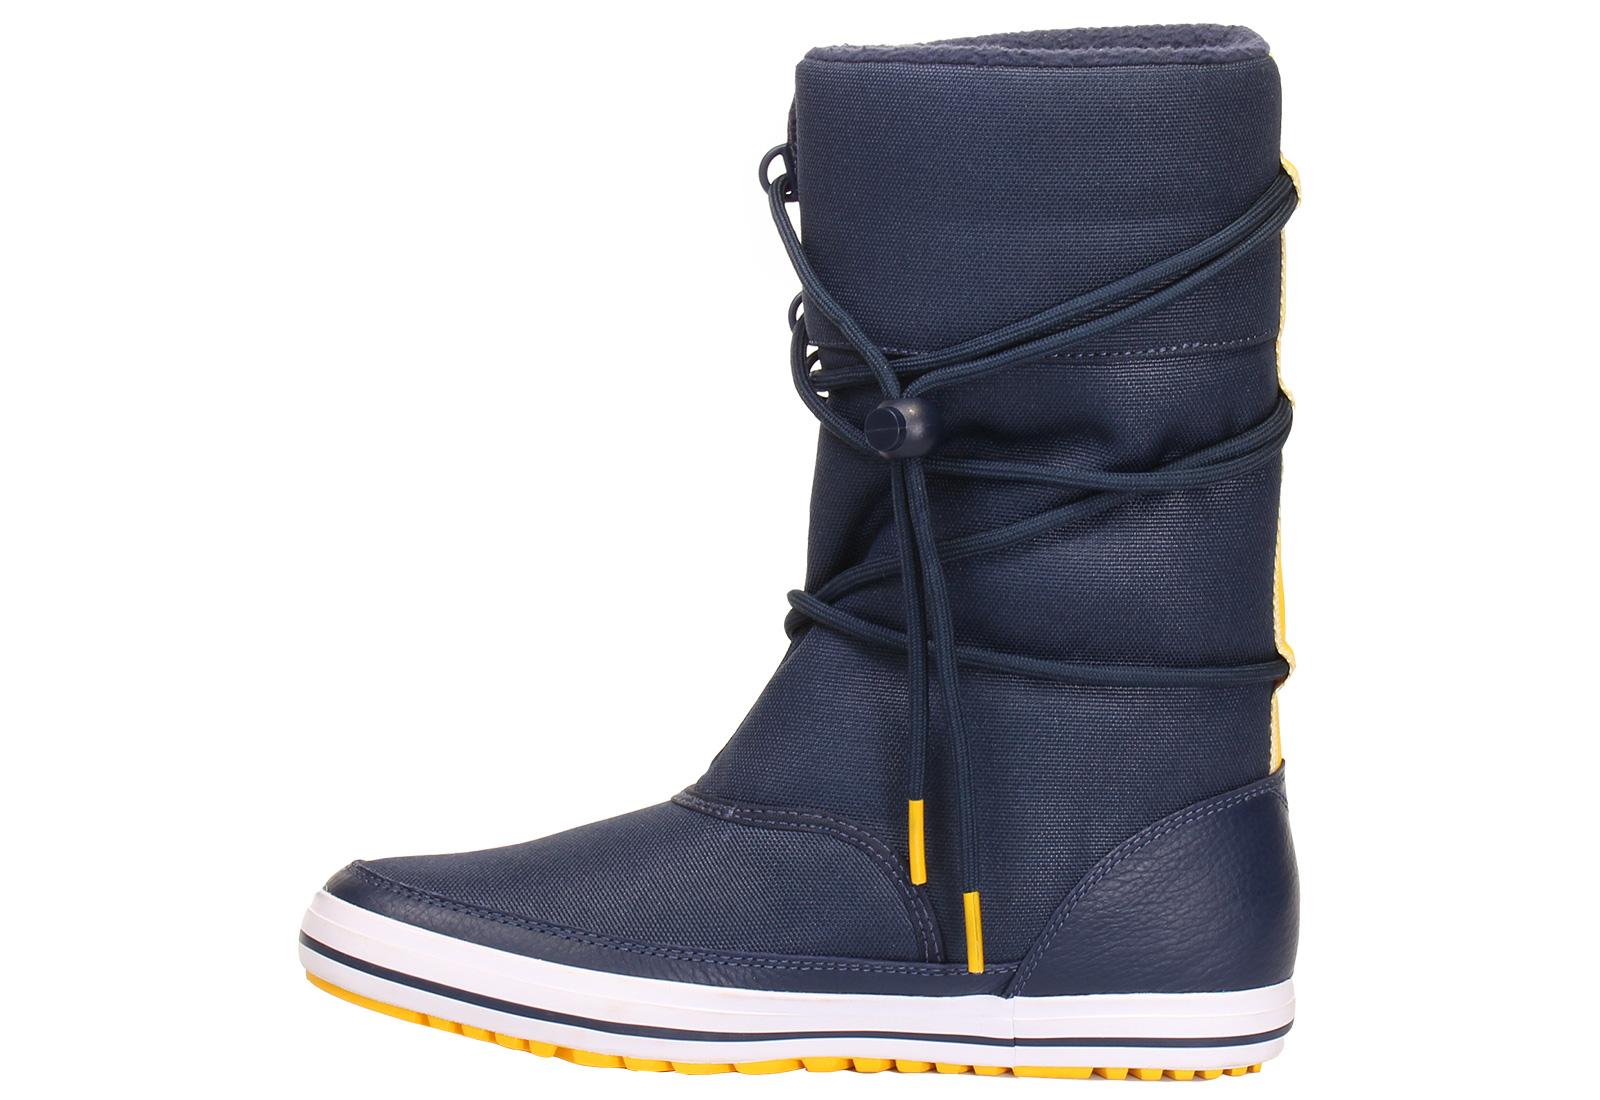 Lacoste Csizma - Torrino - 133spw1022-250 - Office Shoes Magyarország 6bd8f32302